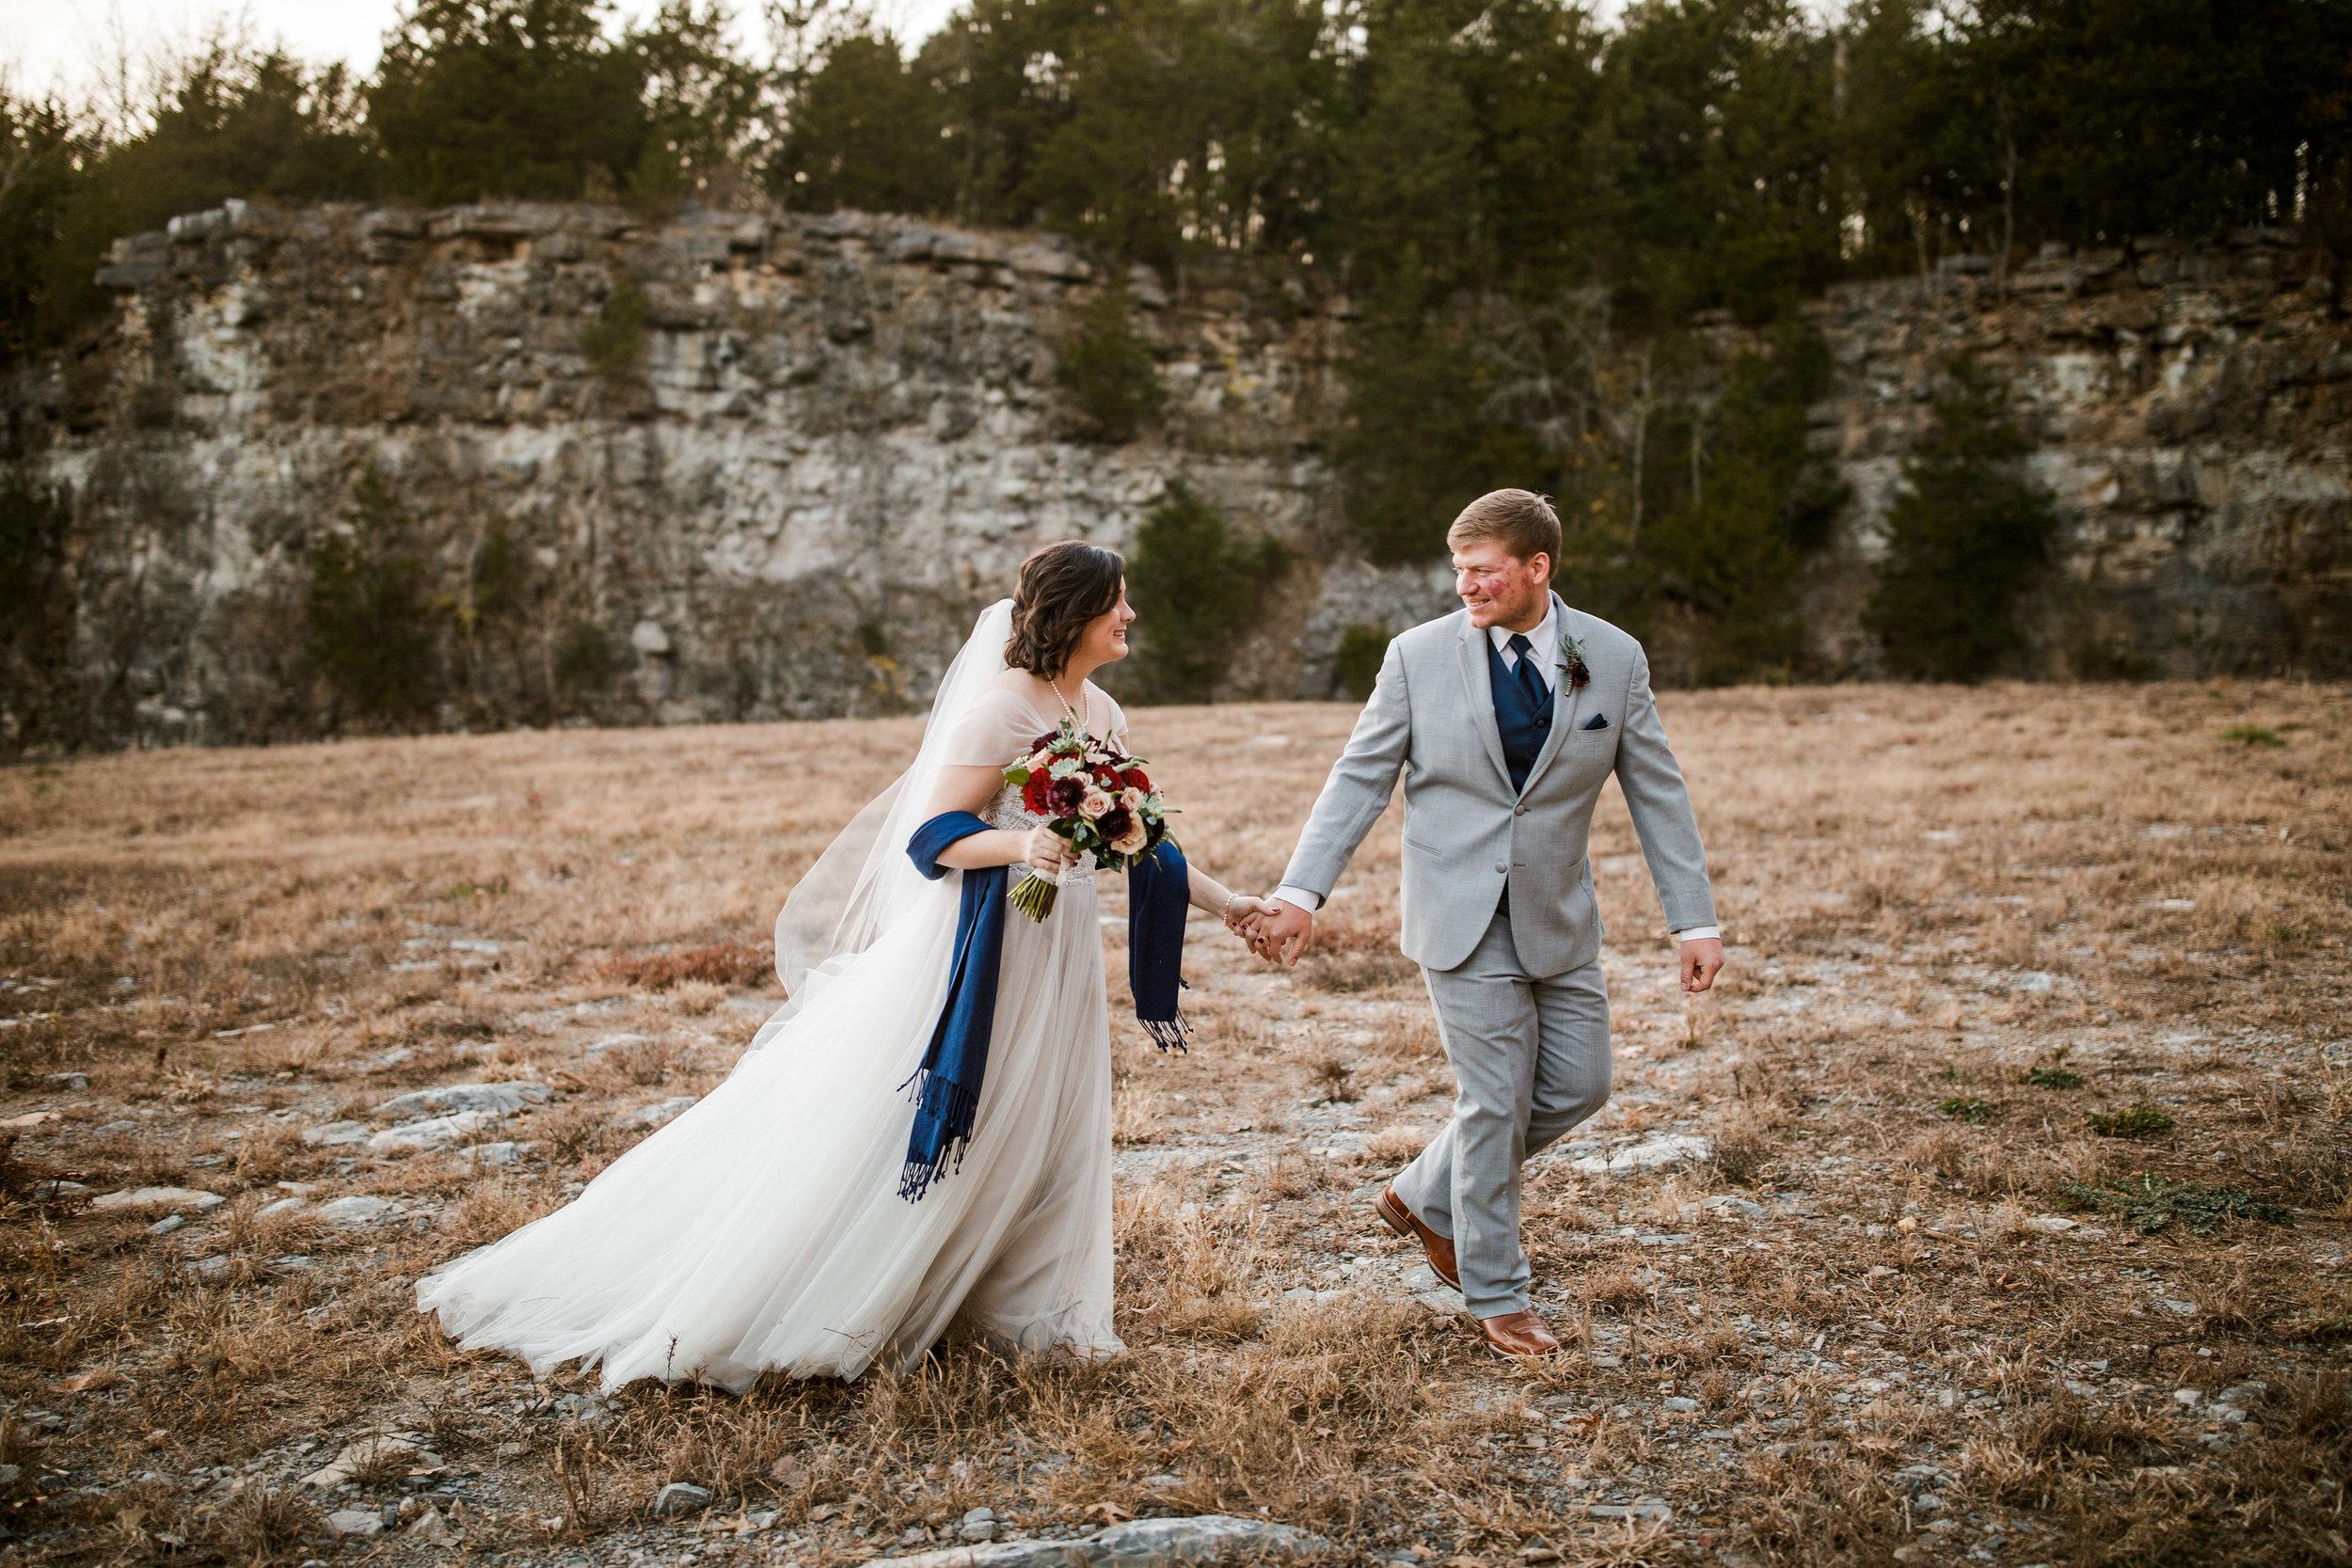 Graystone-Quarry-Wedding 64.jpg